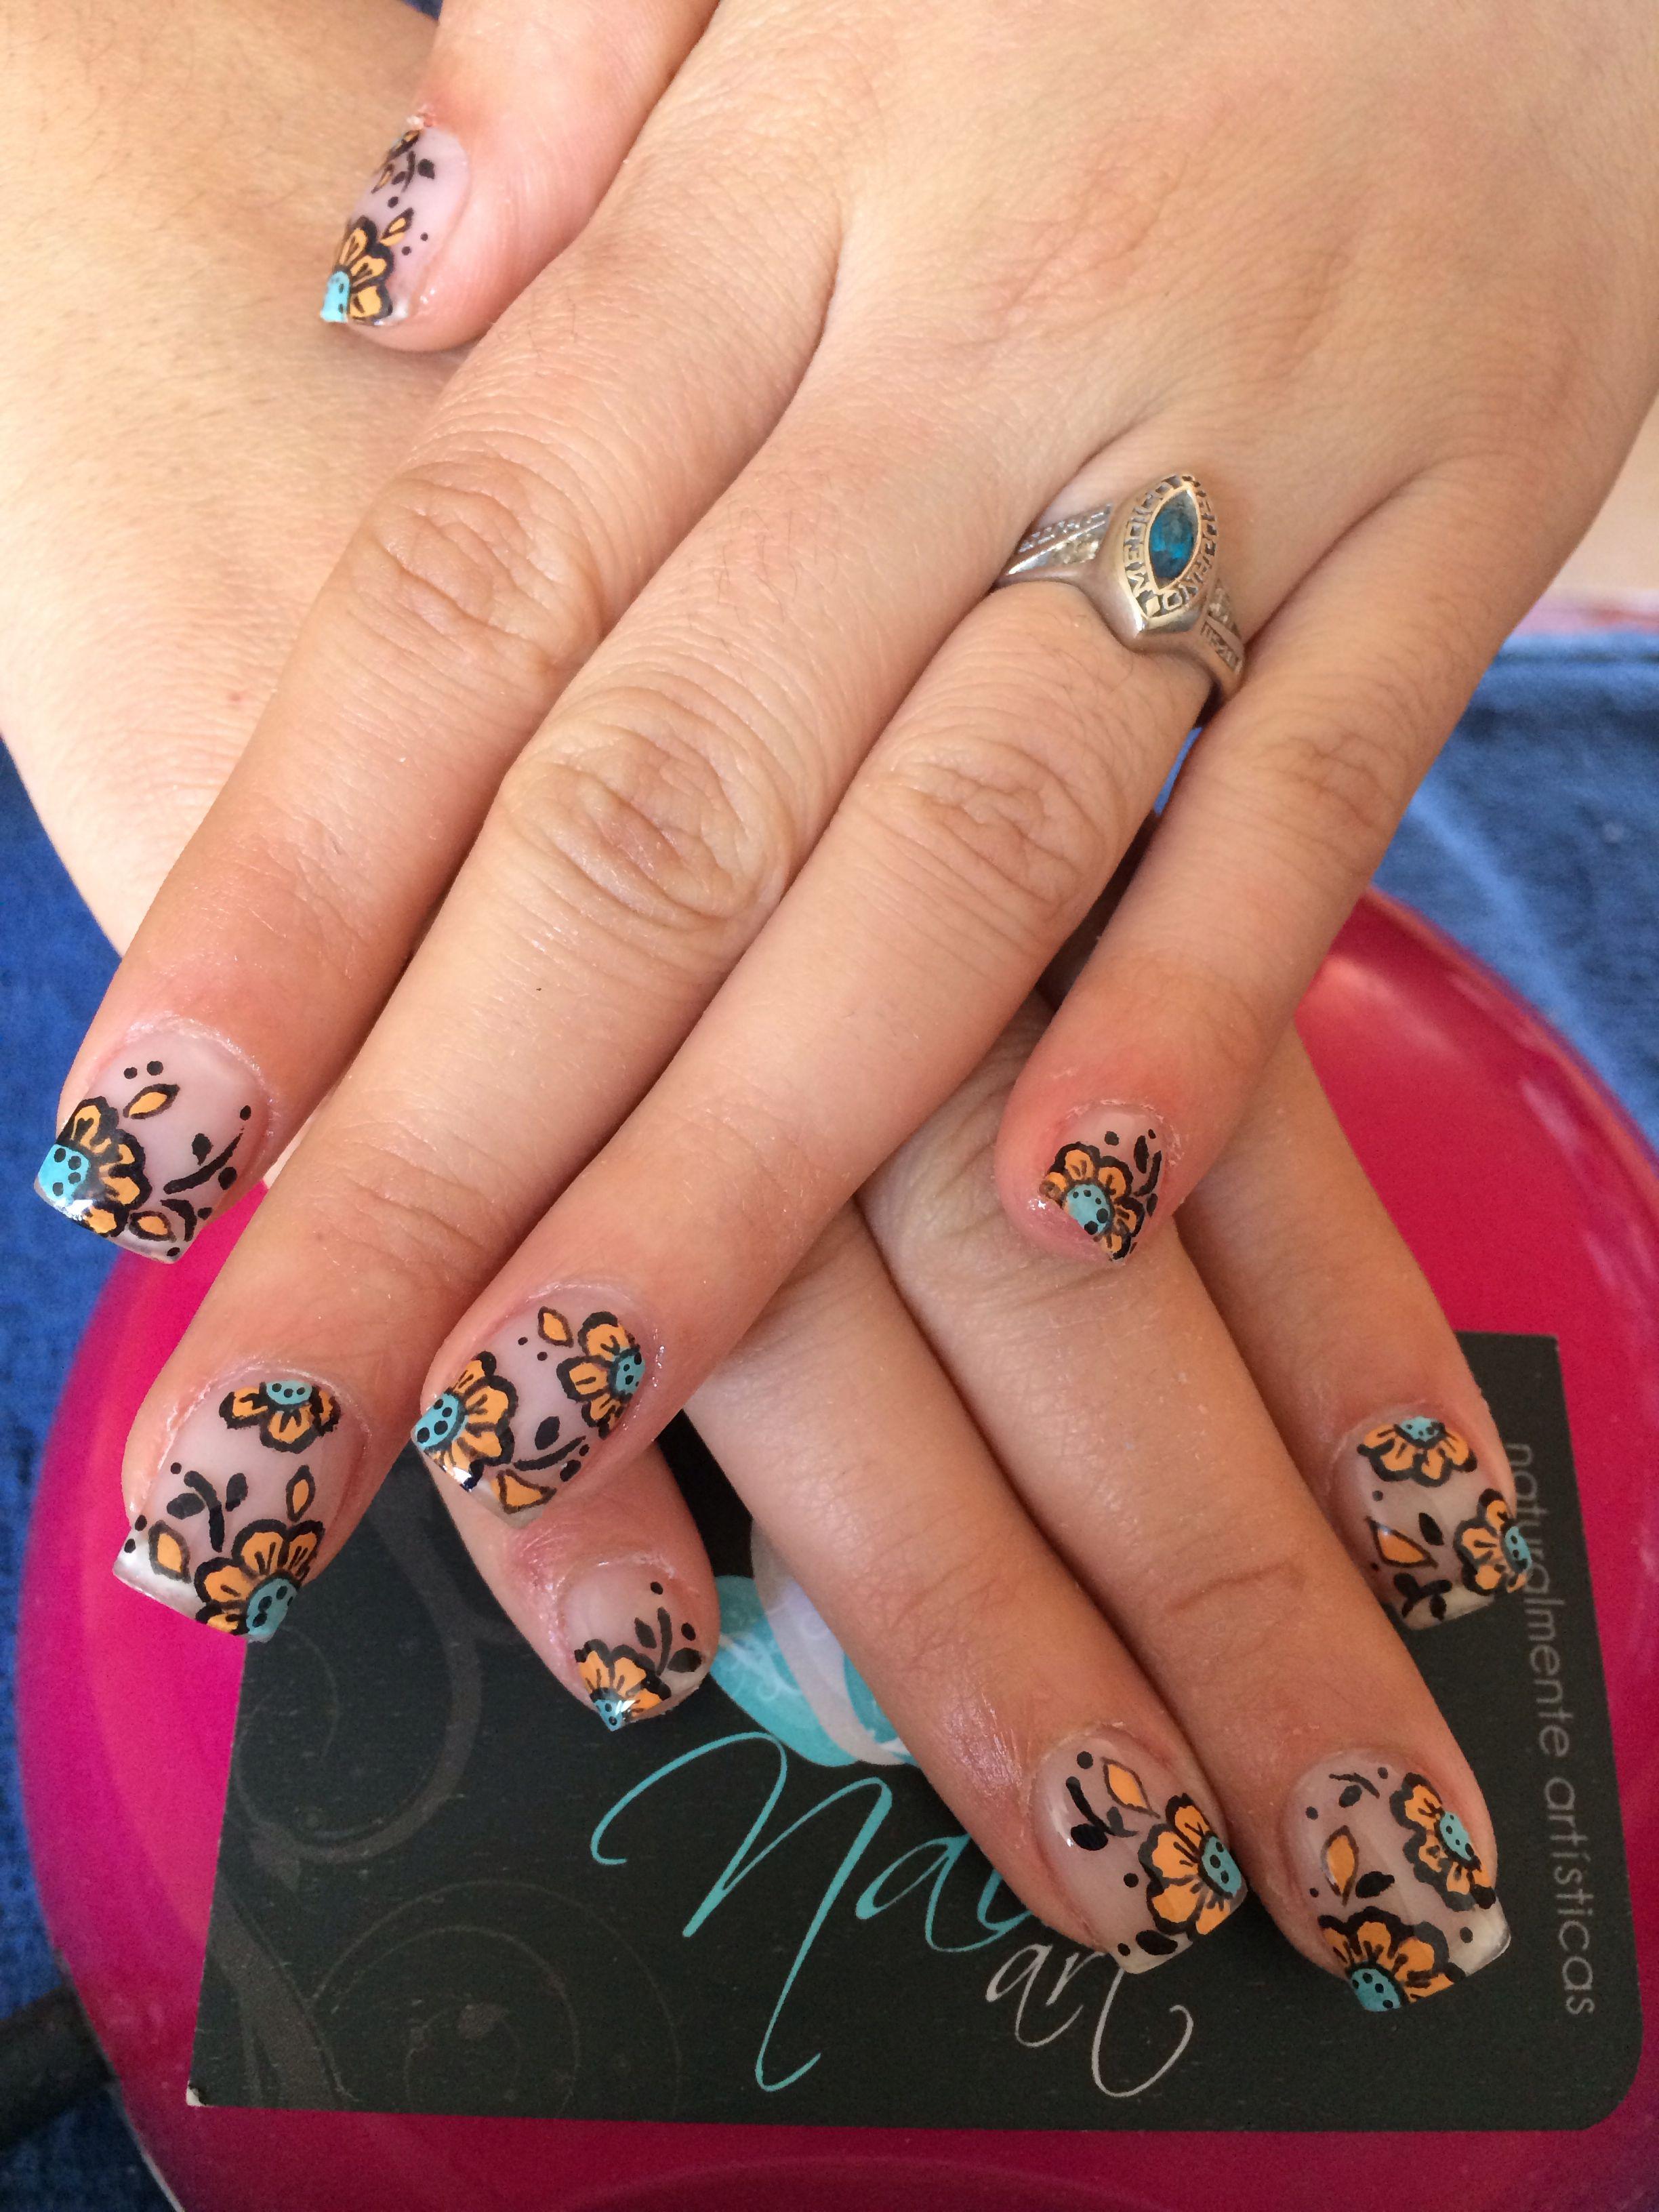 Nails art, acrylic nails, flower nails